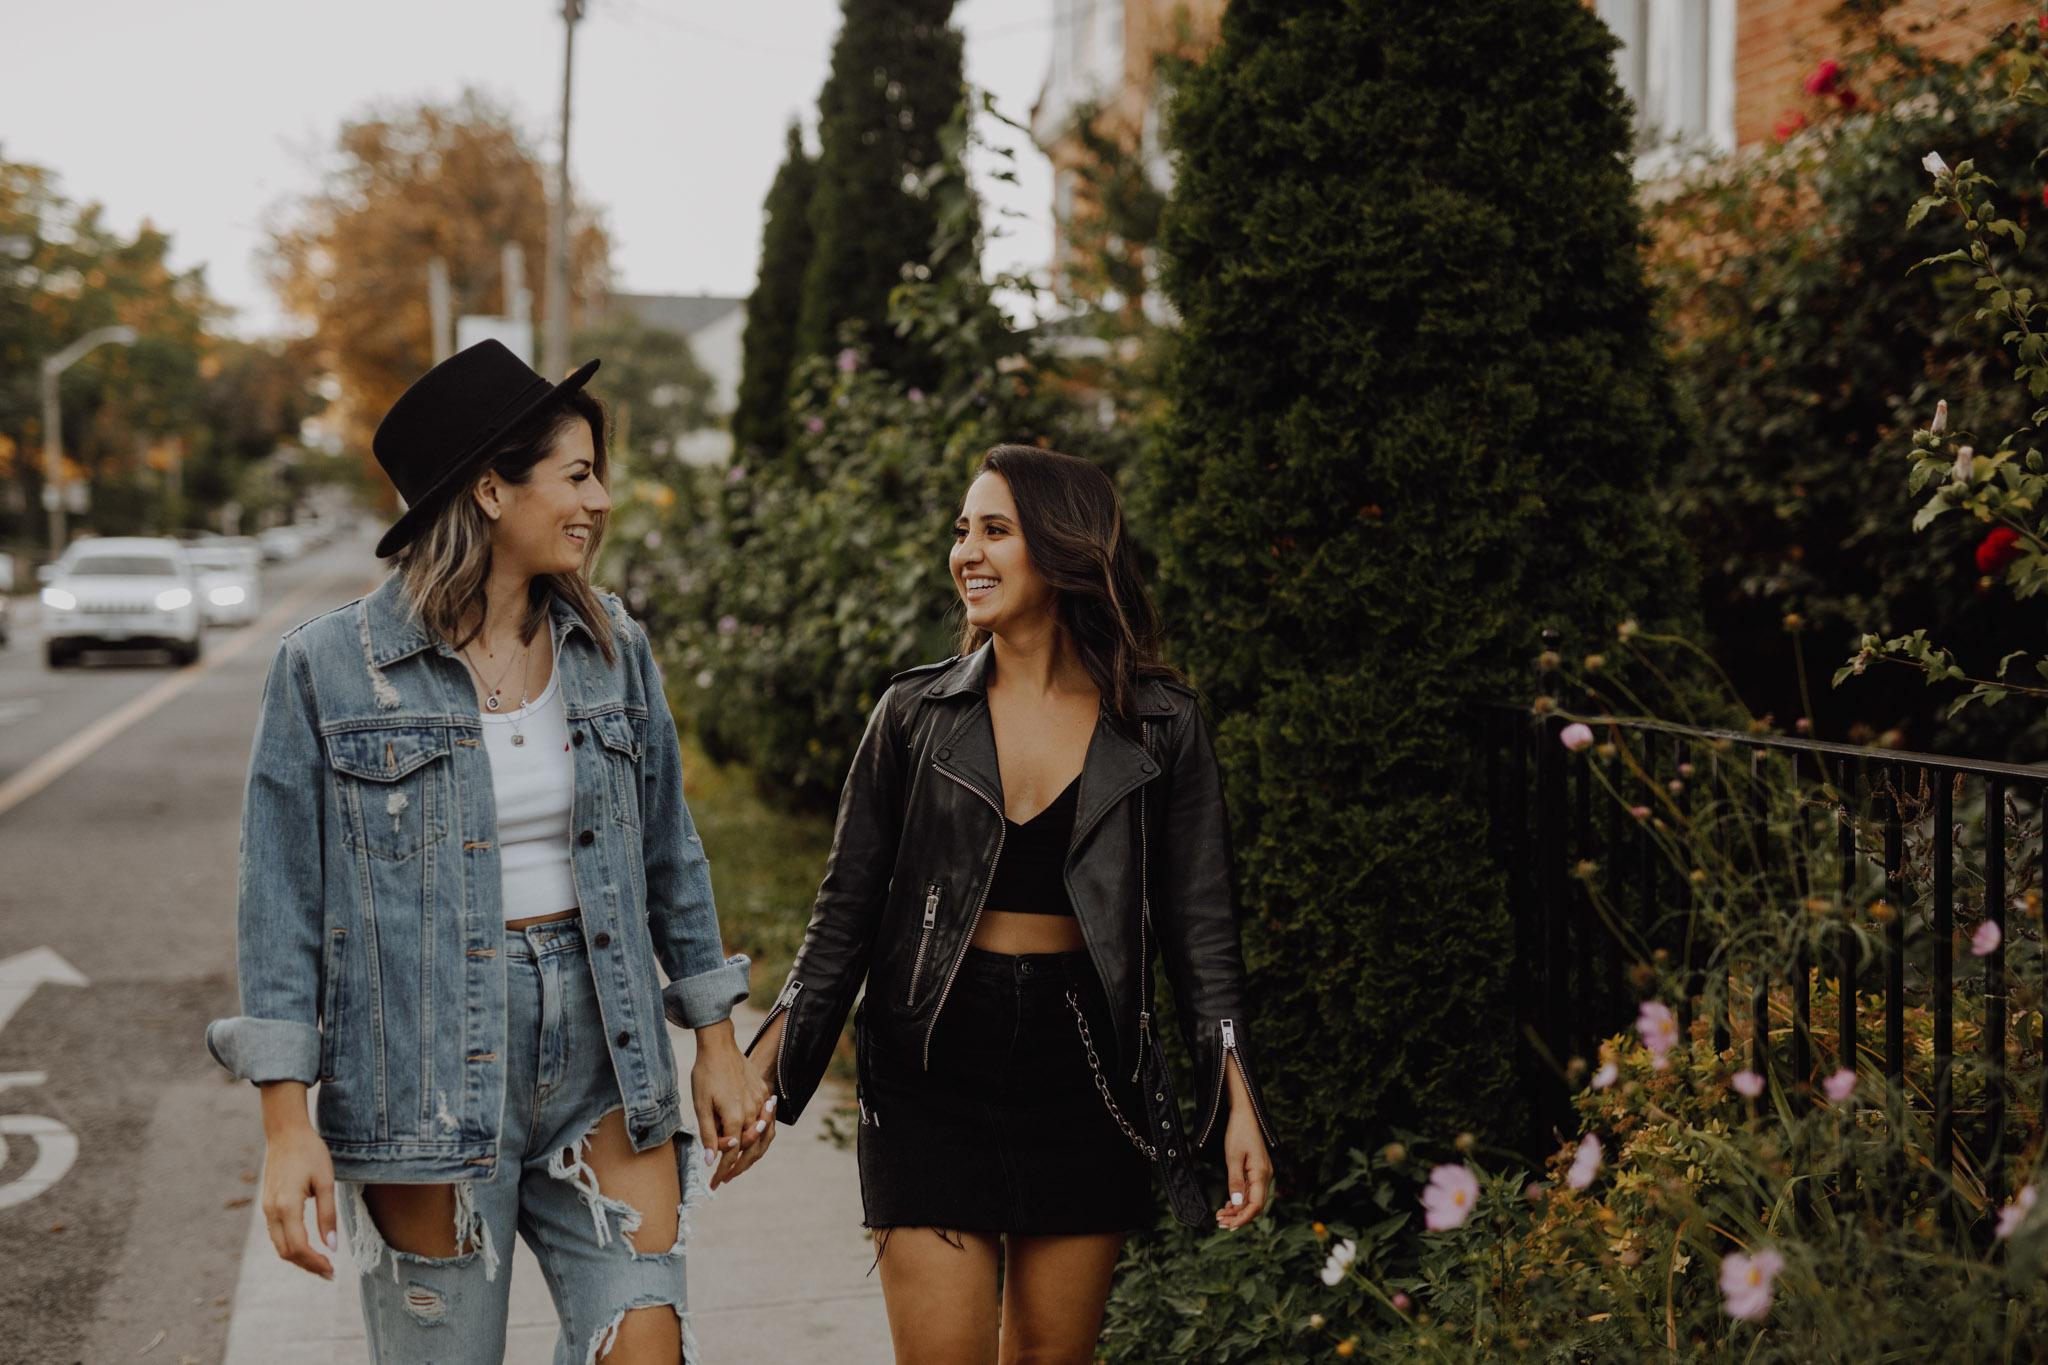 Mcdonalds engagement session - women holding hands